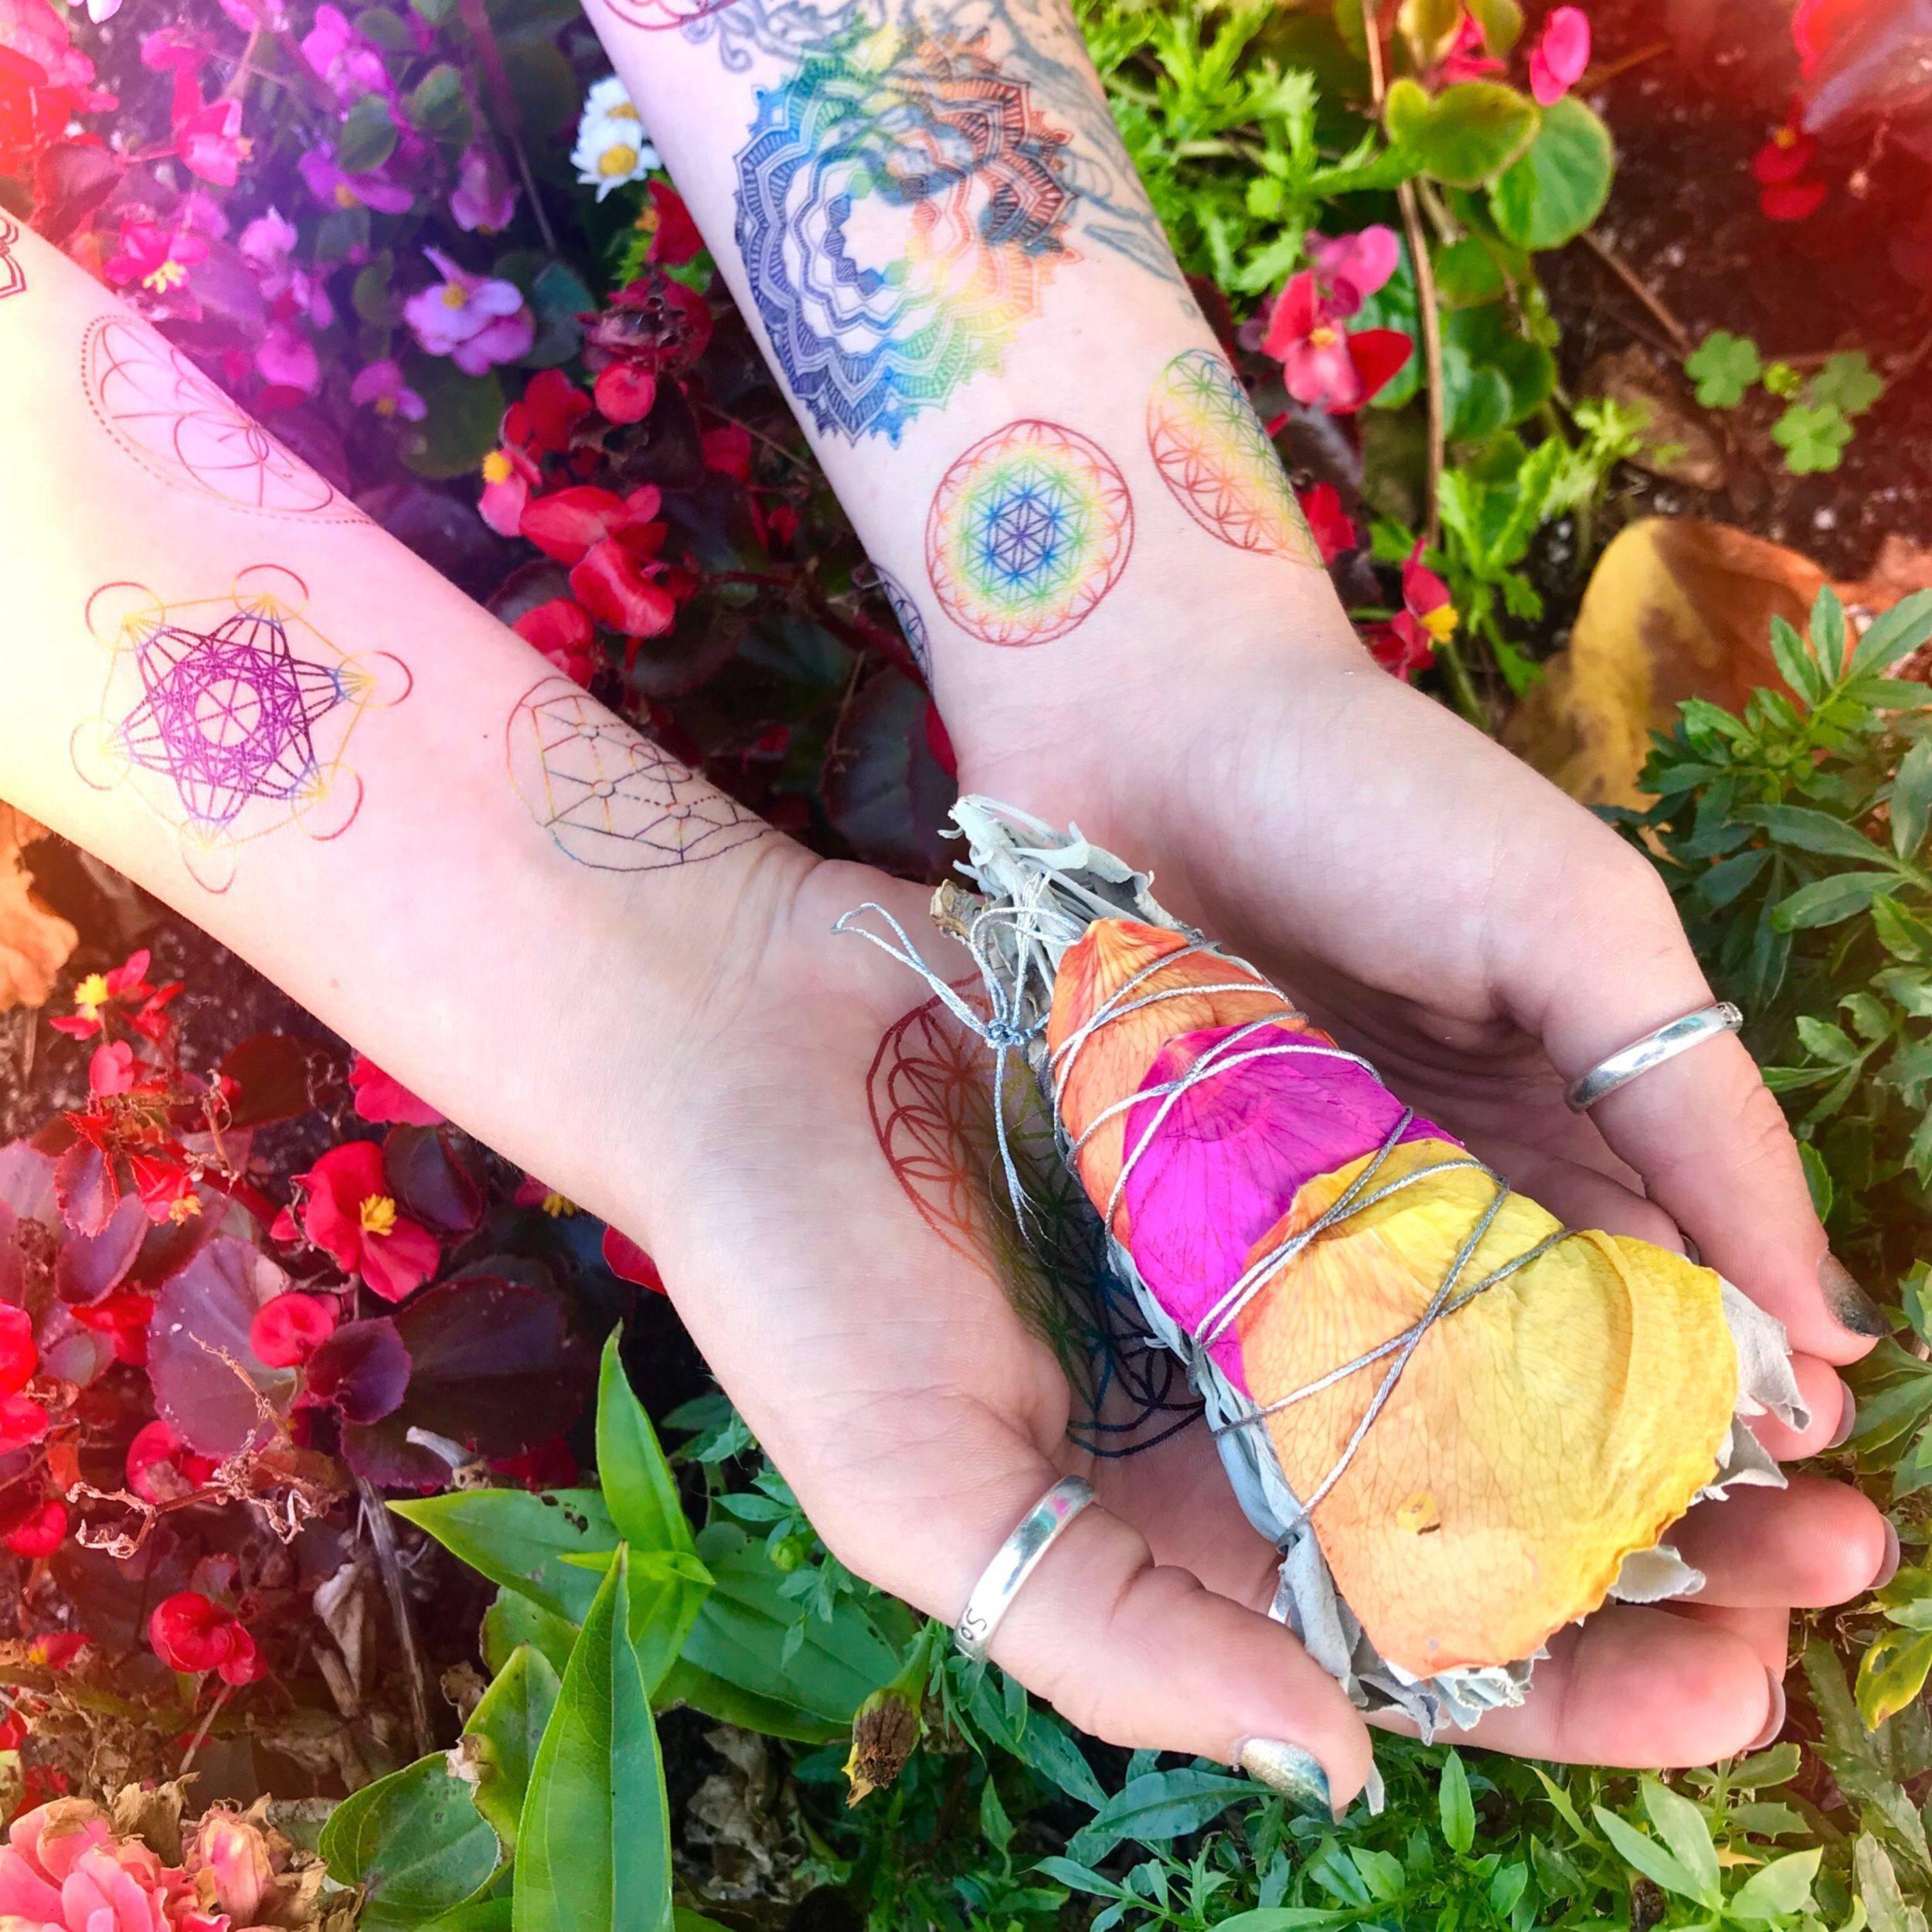 Rainbow_Tattoo_3_Pack_1OF2_9_4